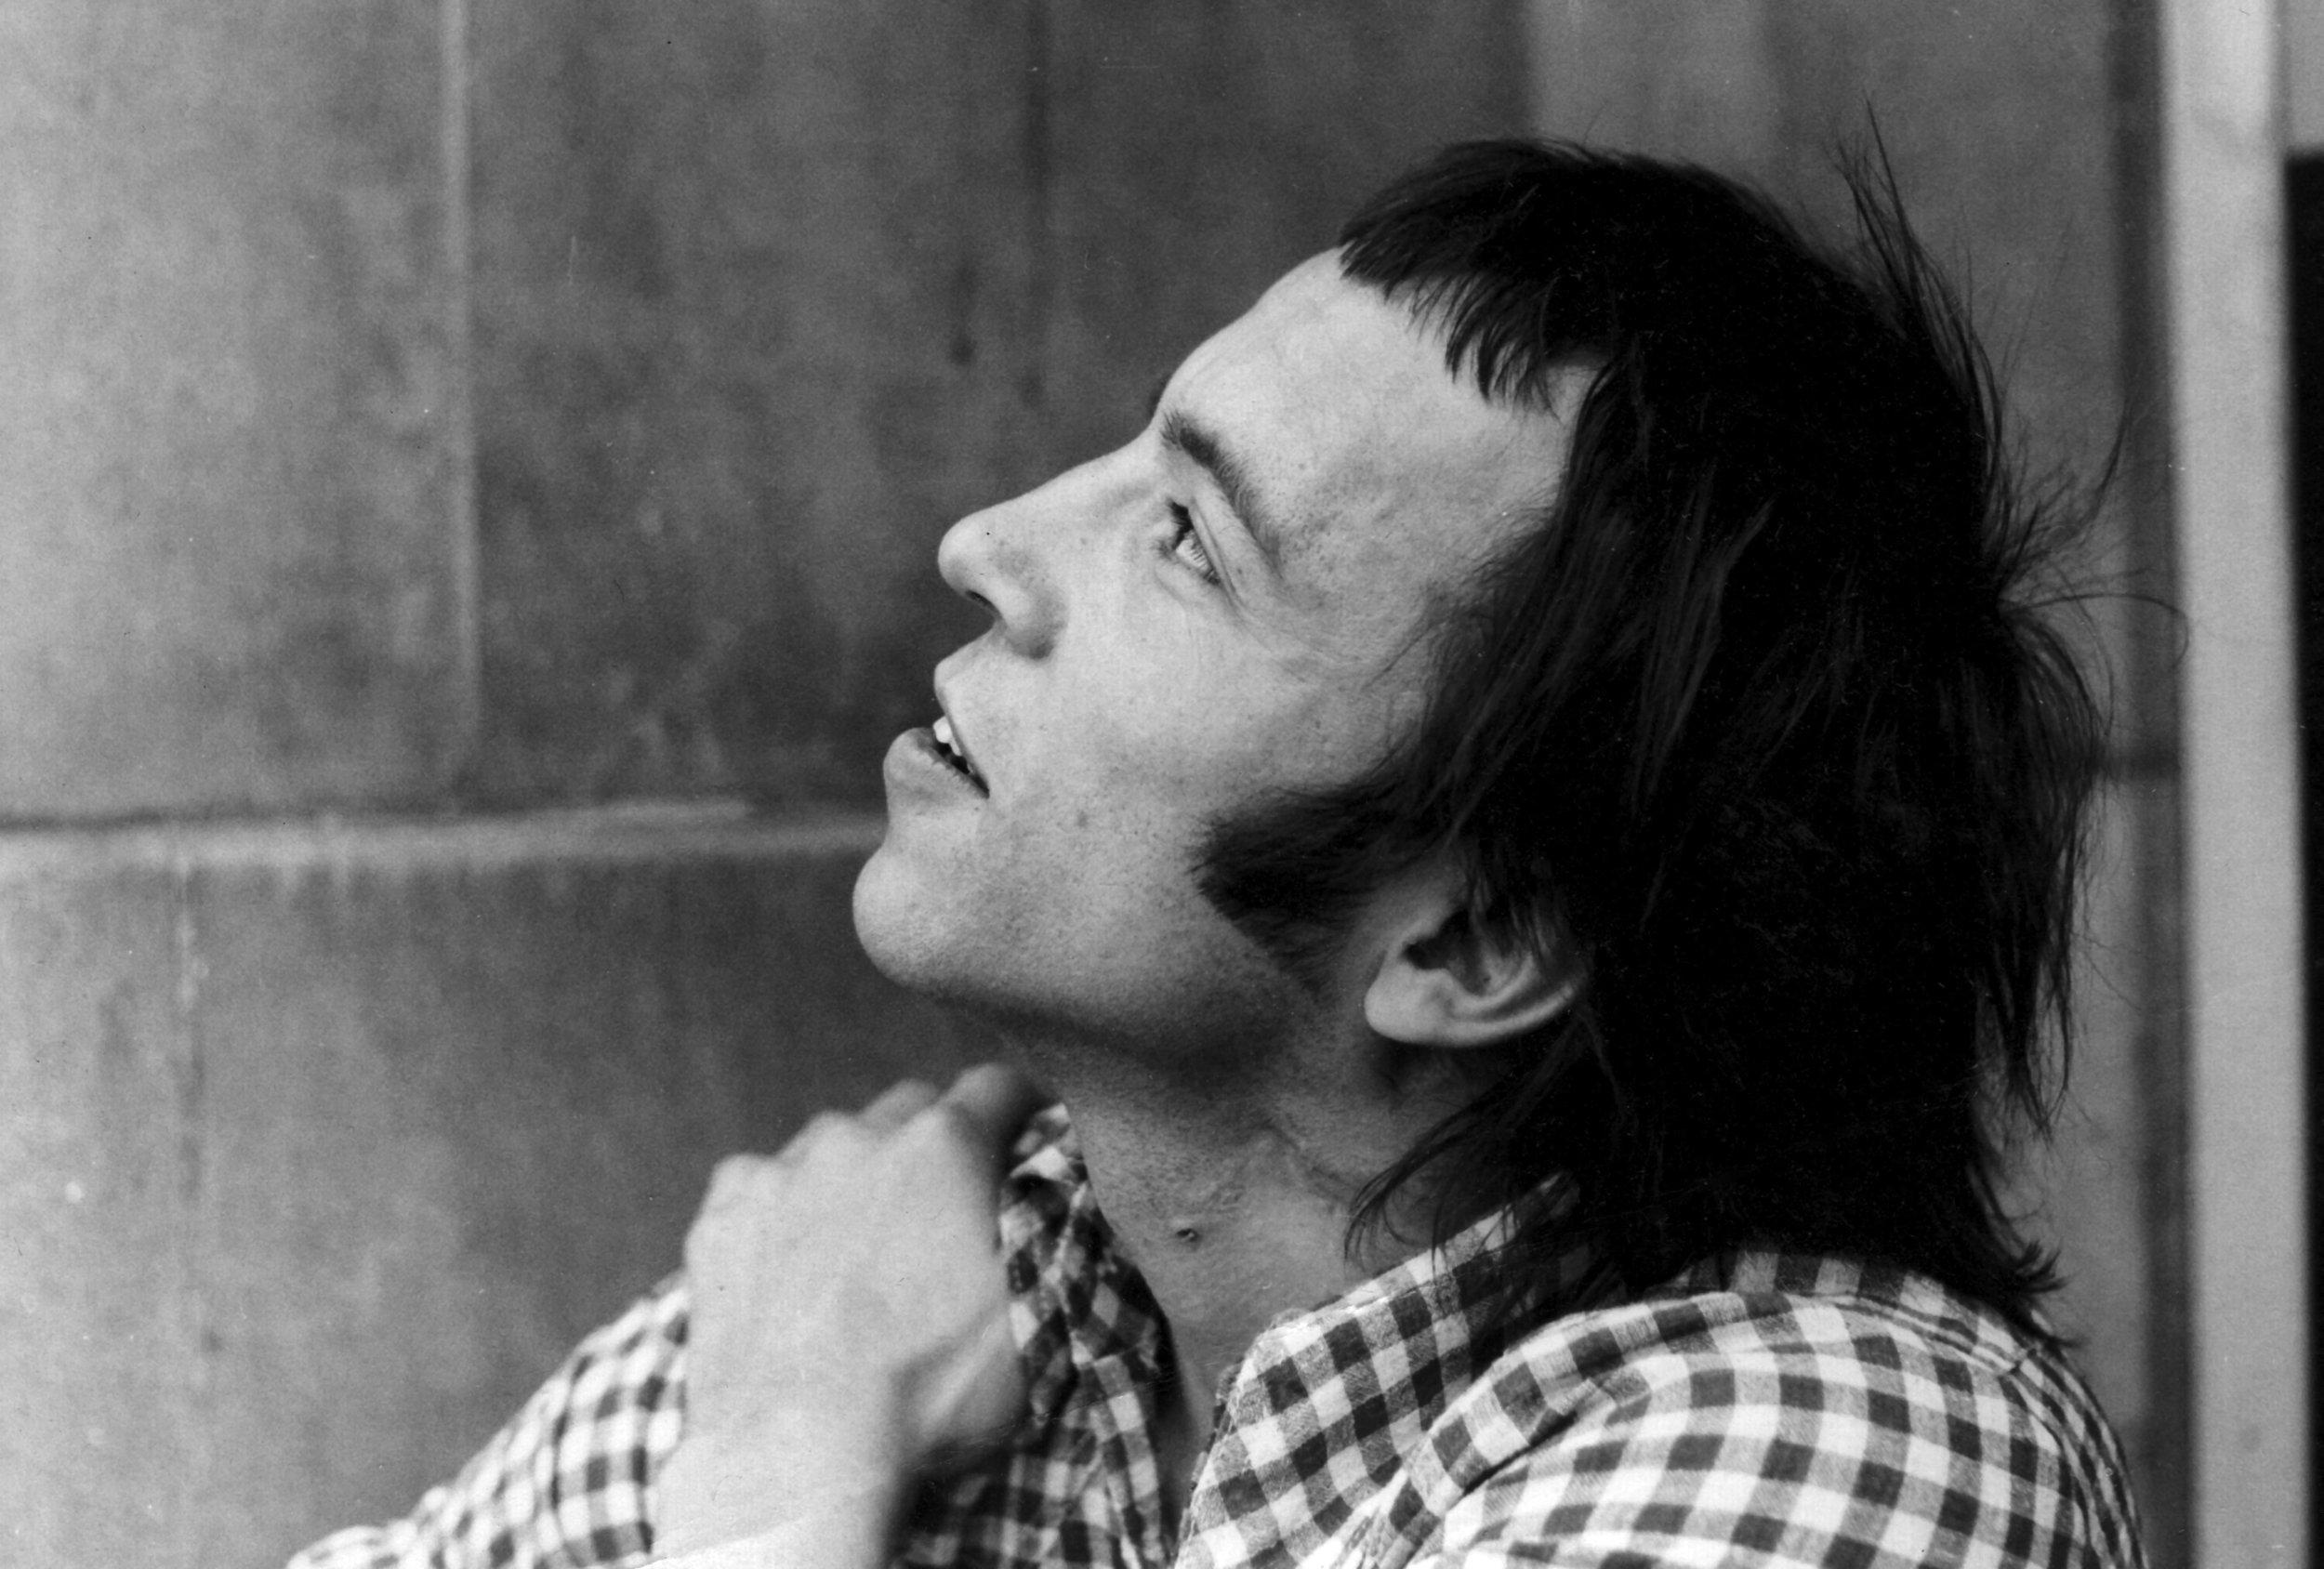 David Widgery sitting in a doorway in Soho in 1973. (Image: Michael Gray)